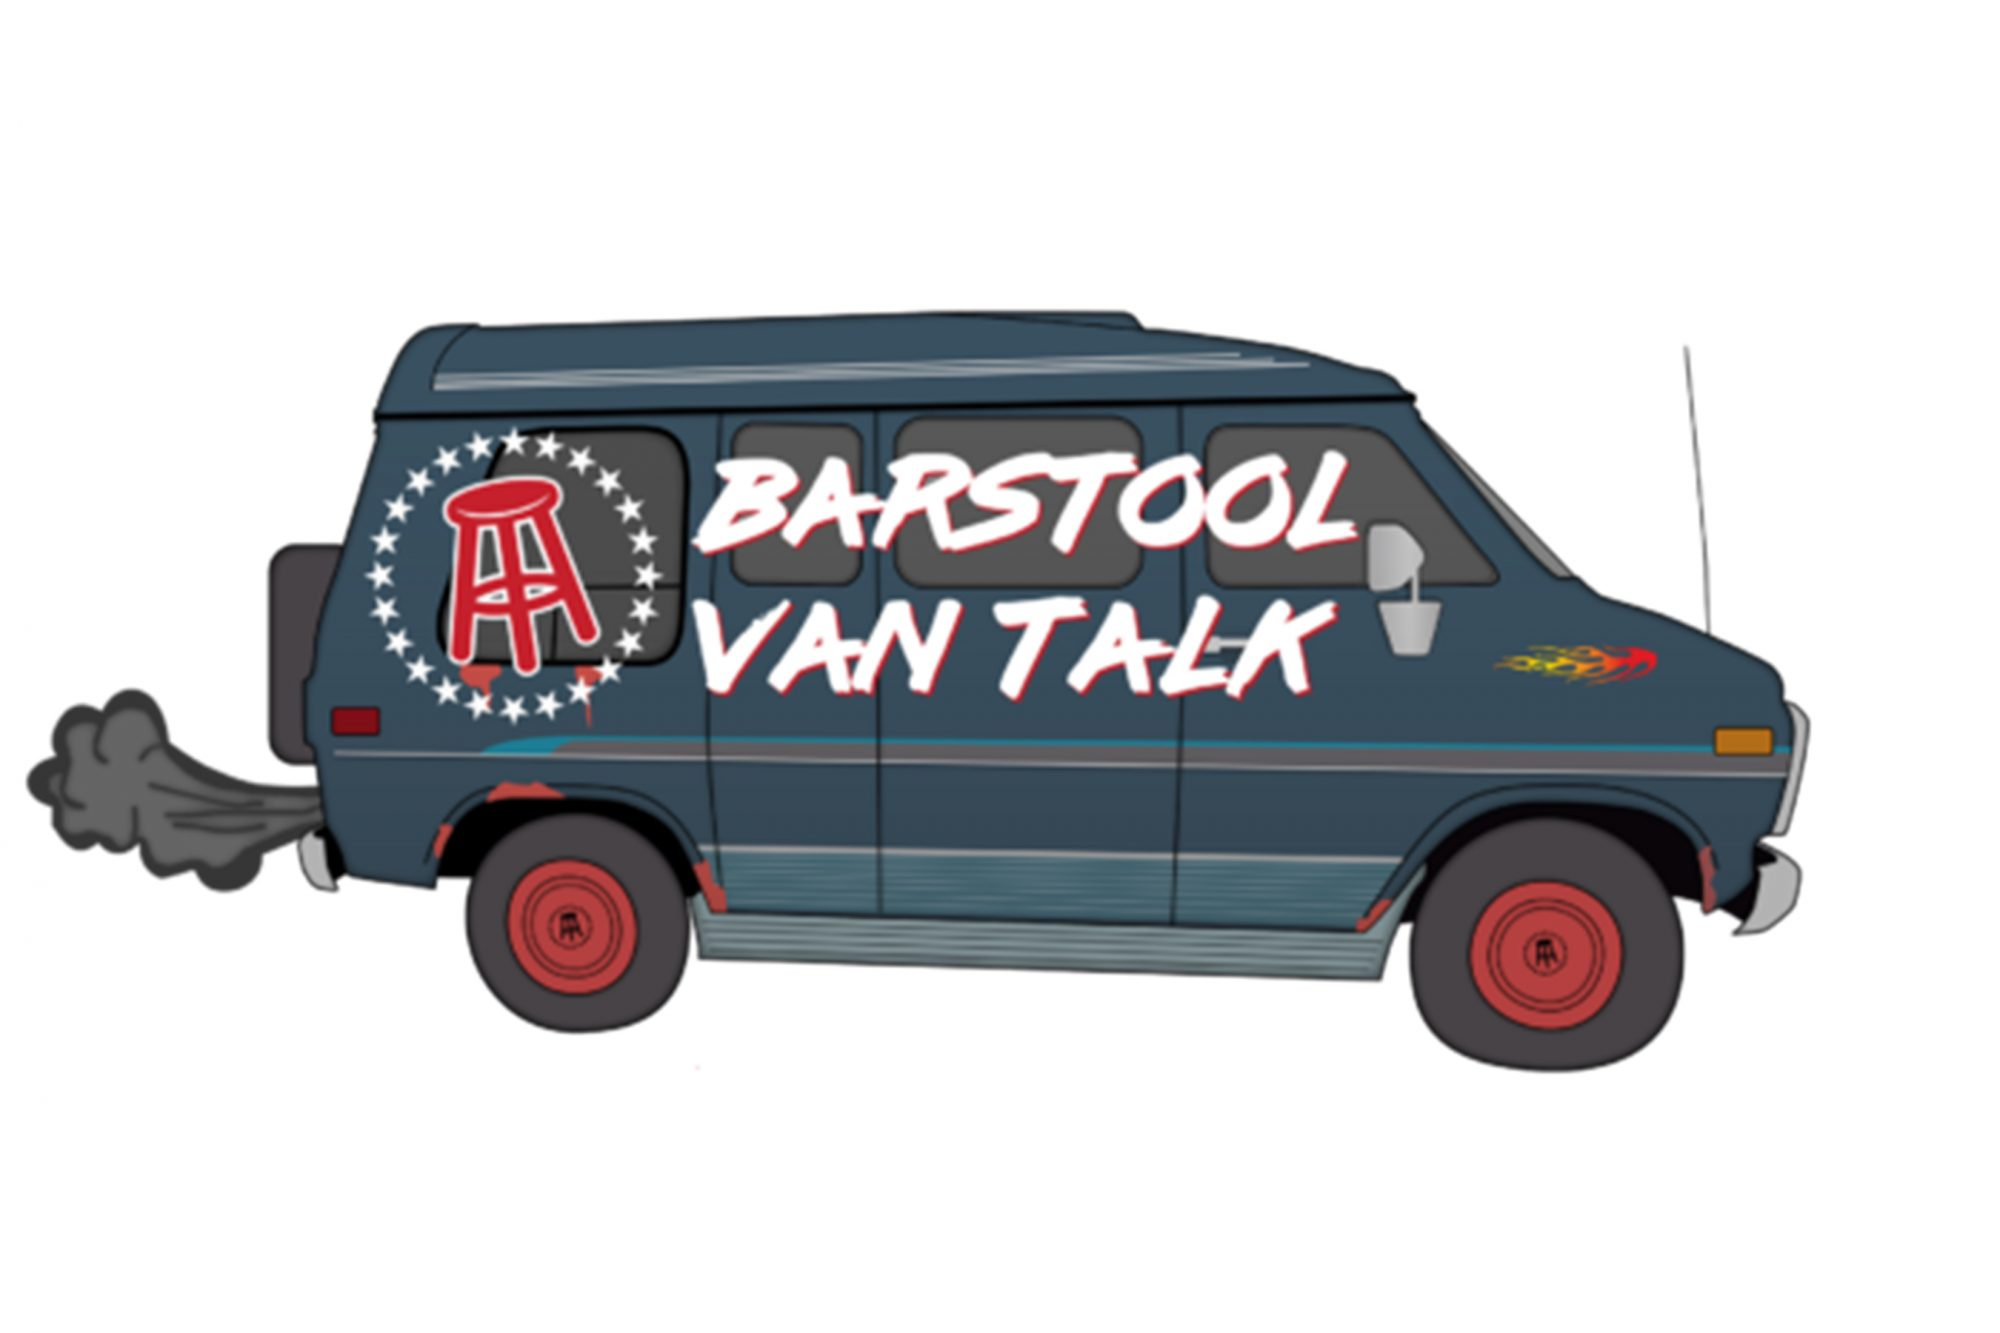 BarstoolVanTalk-Logo-660x400-1